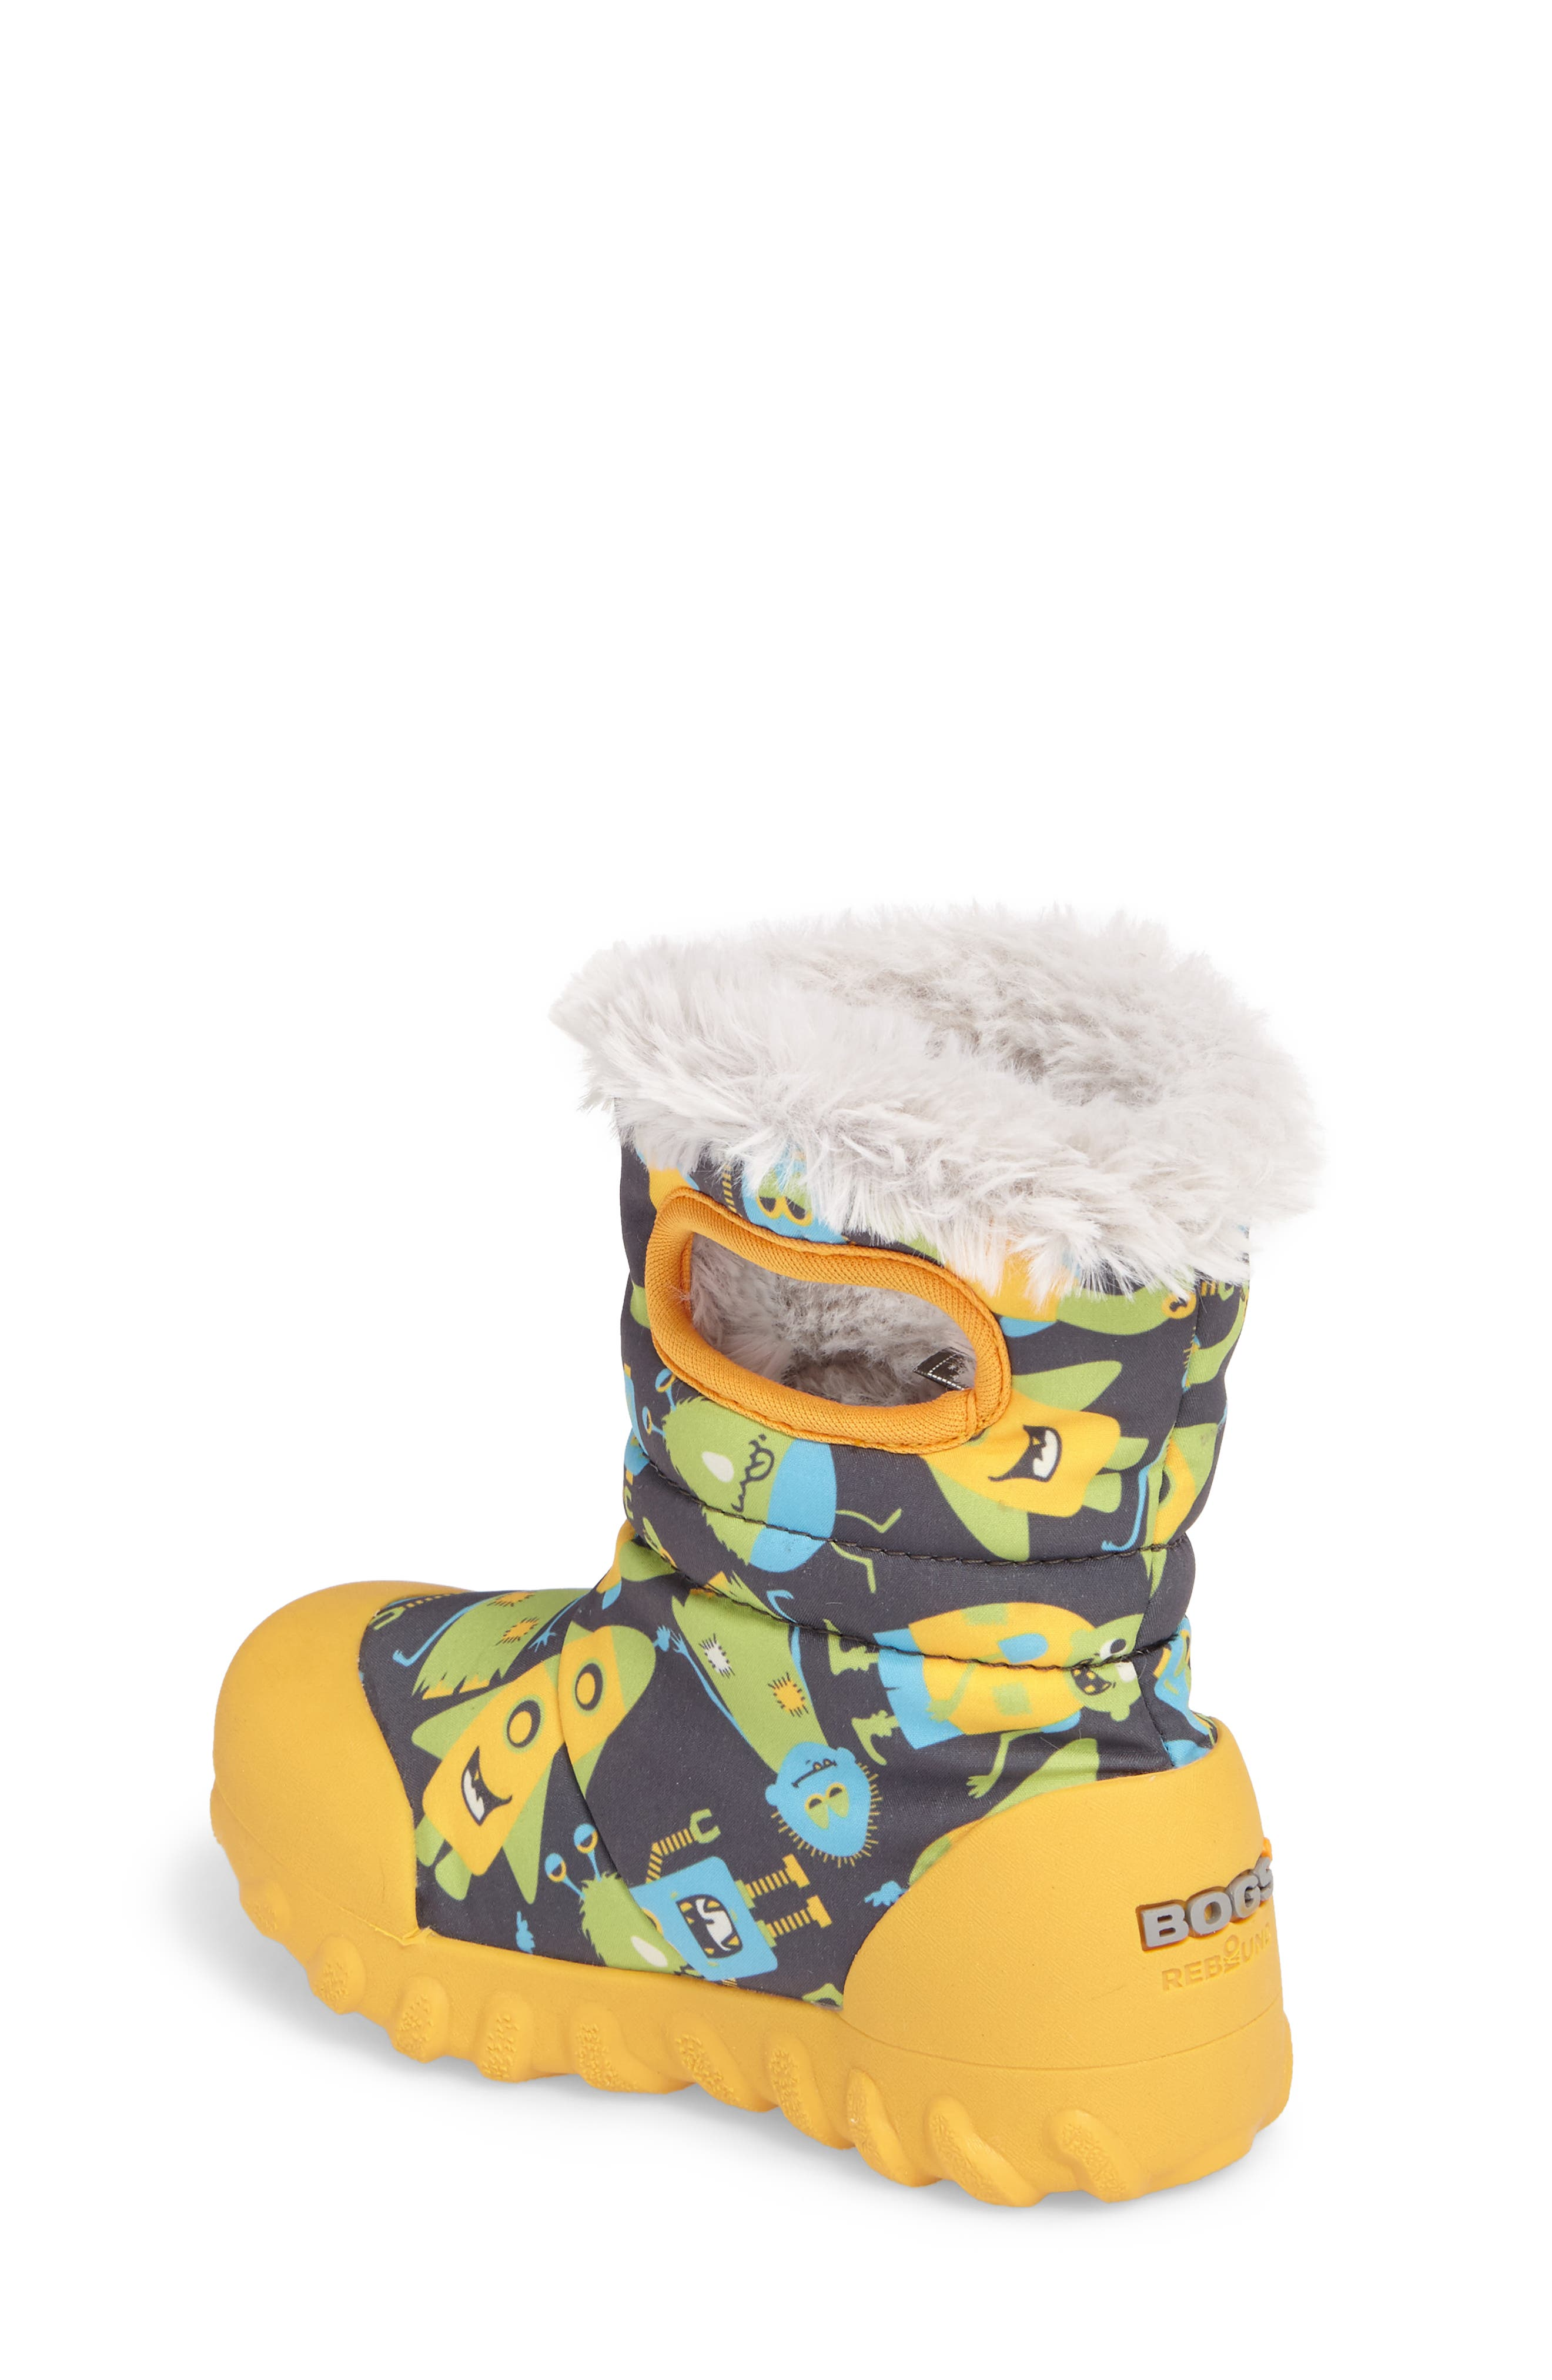 B-MOC Monsters Waterproof Insulated Faux Fur Winter Boot,                             Alternate thumbnail 2, color,                             Dark Gray Multi